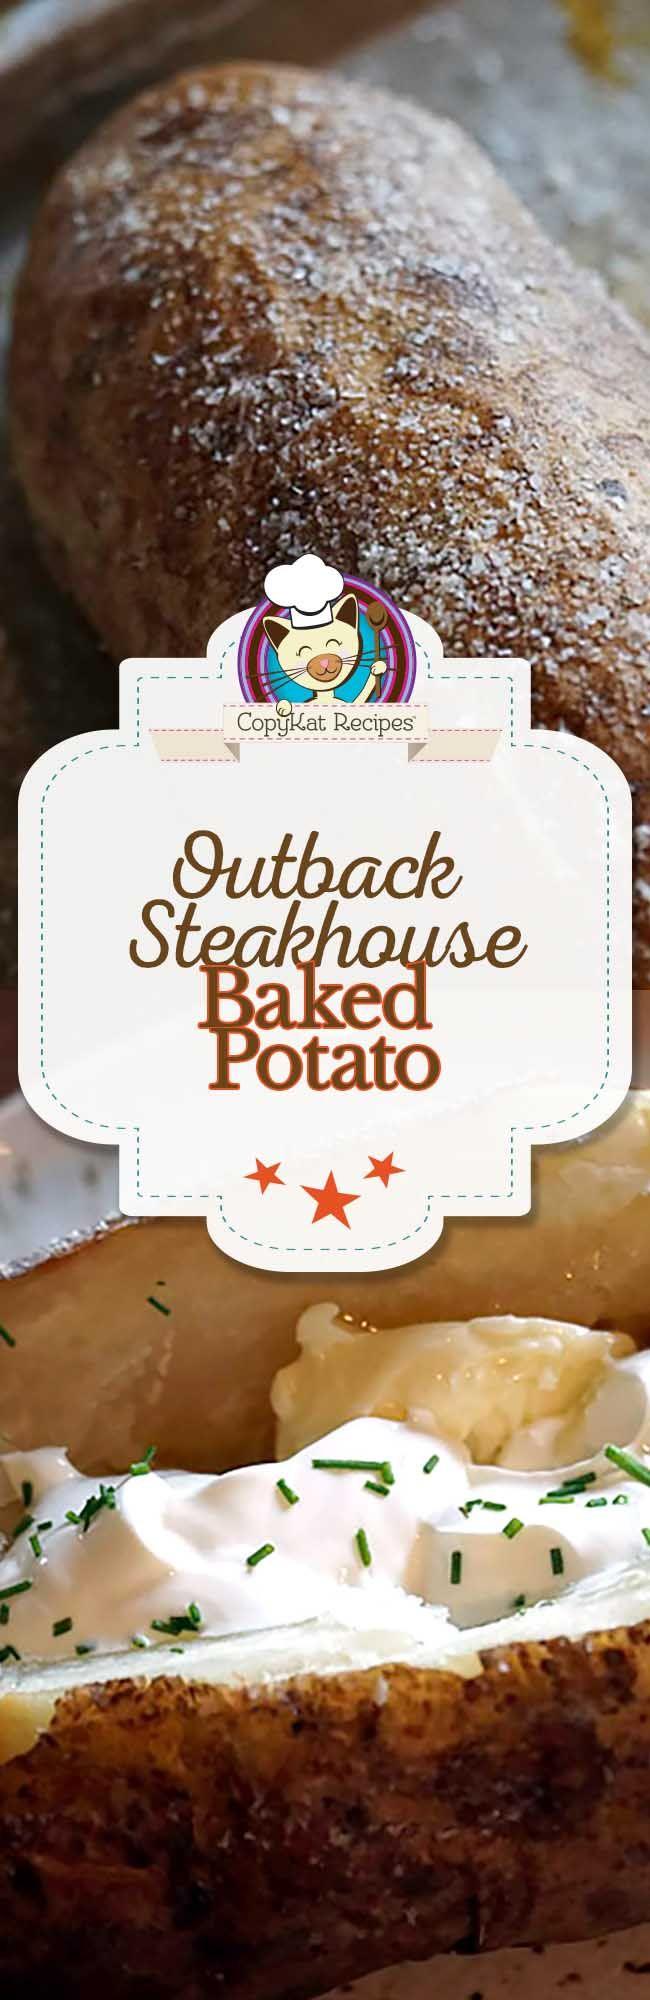 Outback Steakhouse Baked Potato Recipe Copy Cat